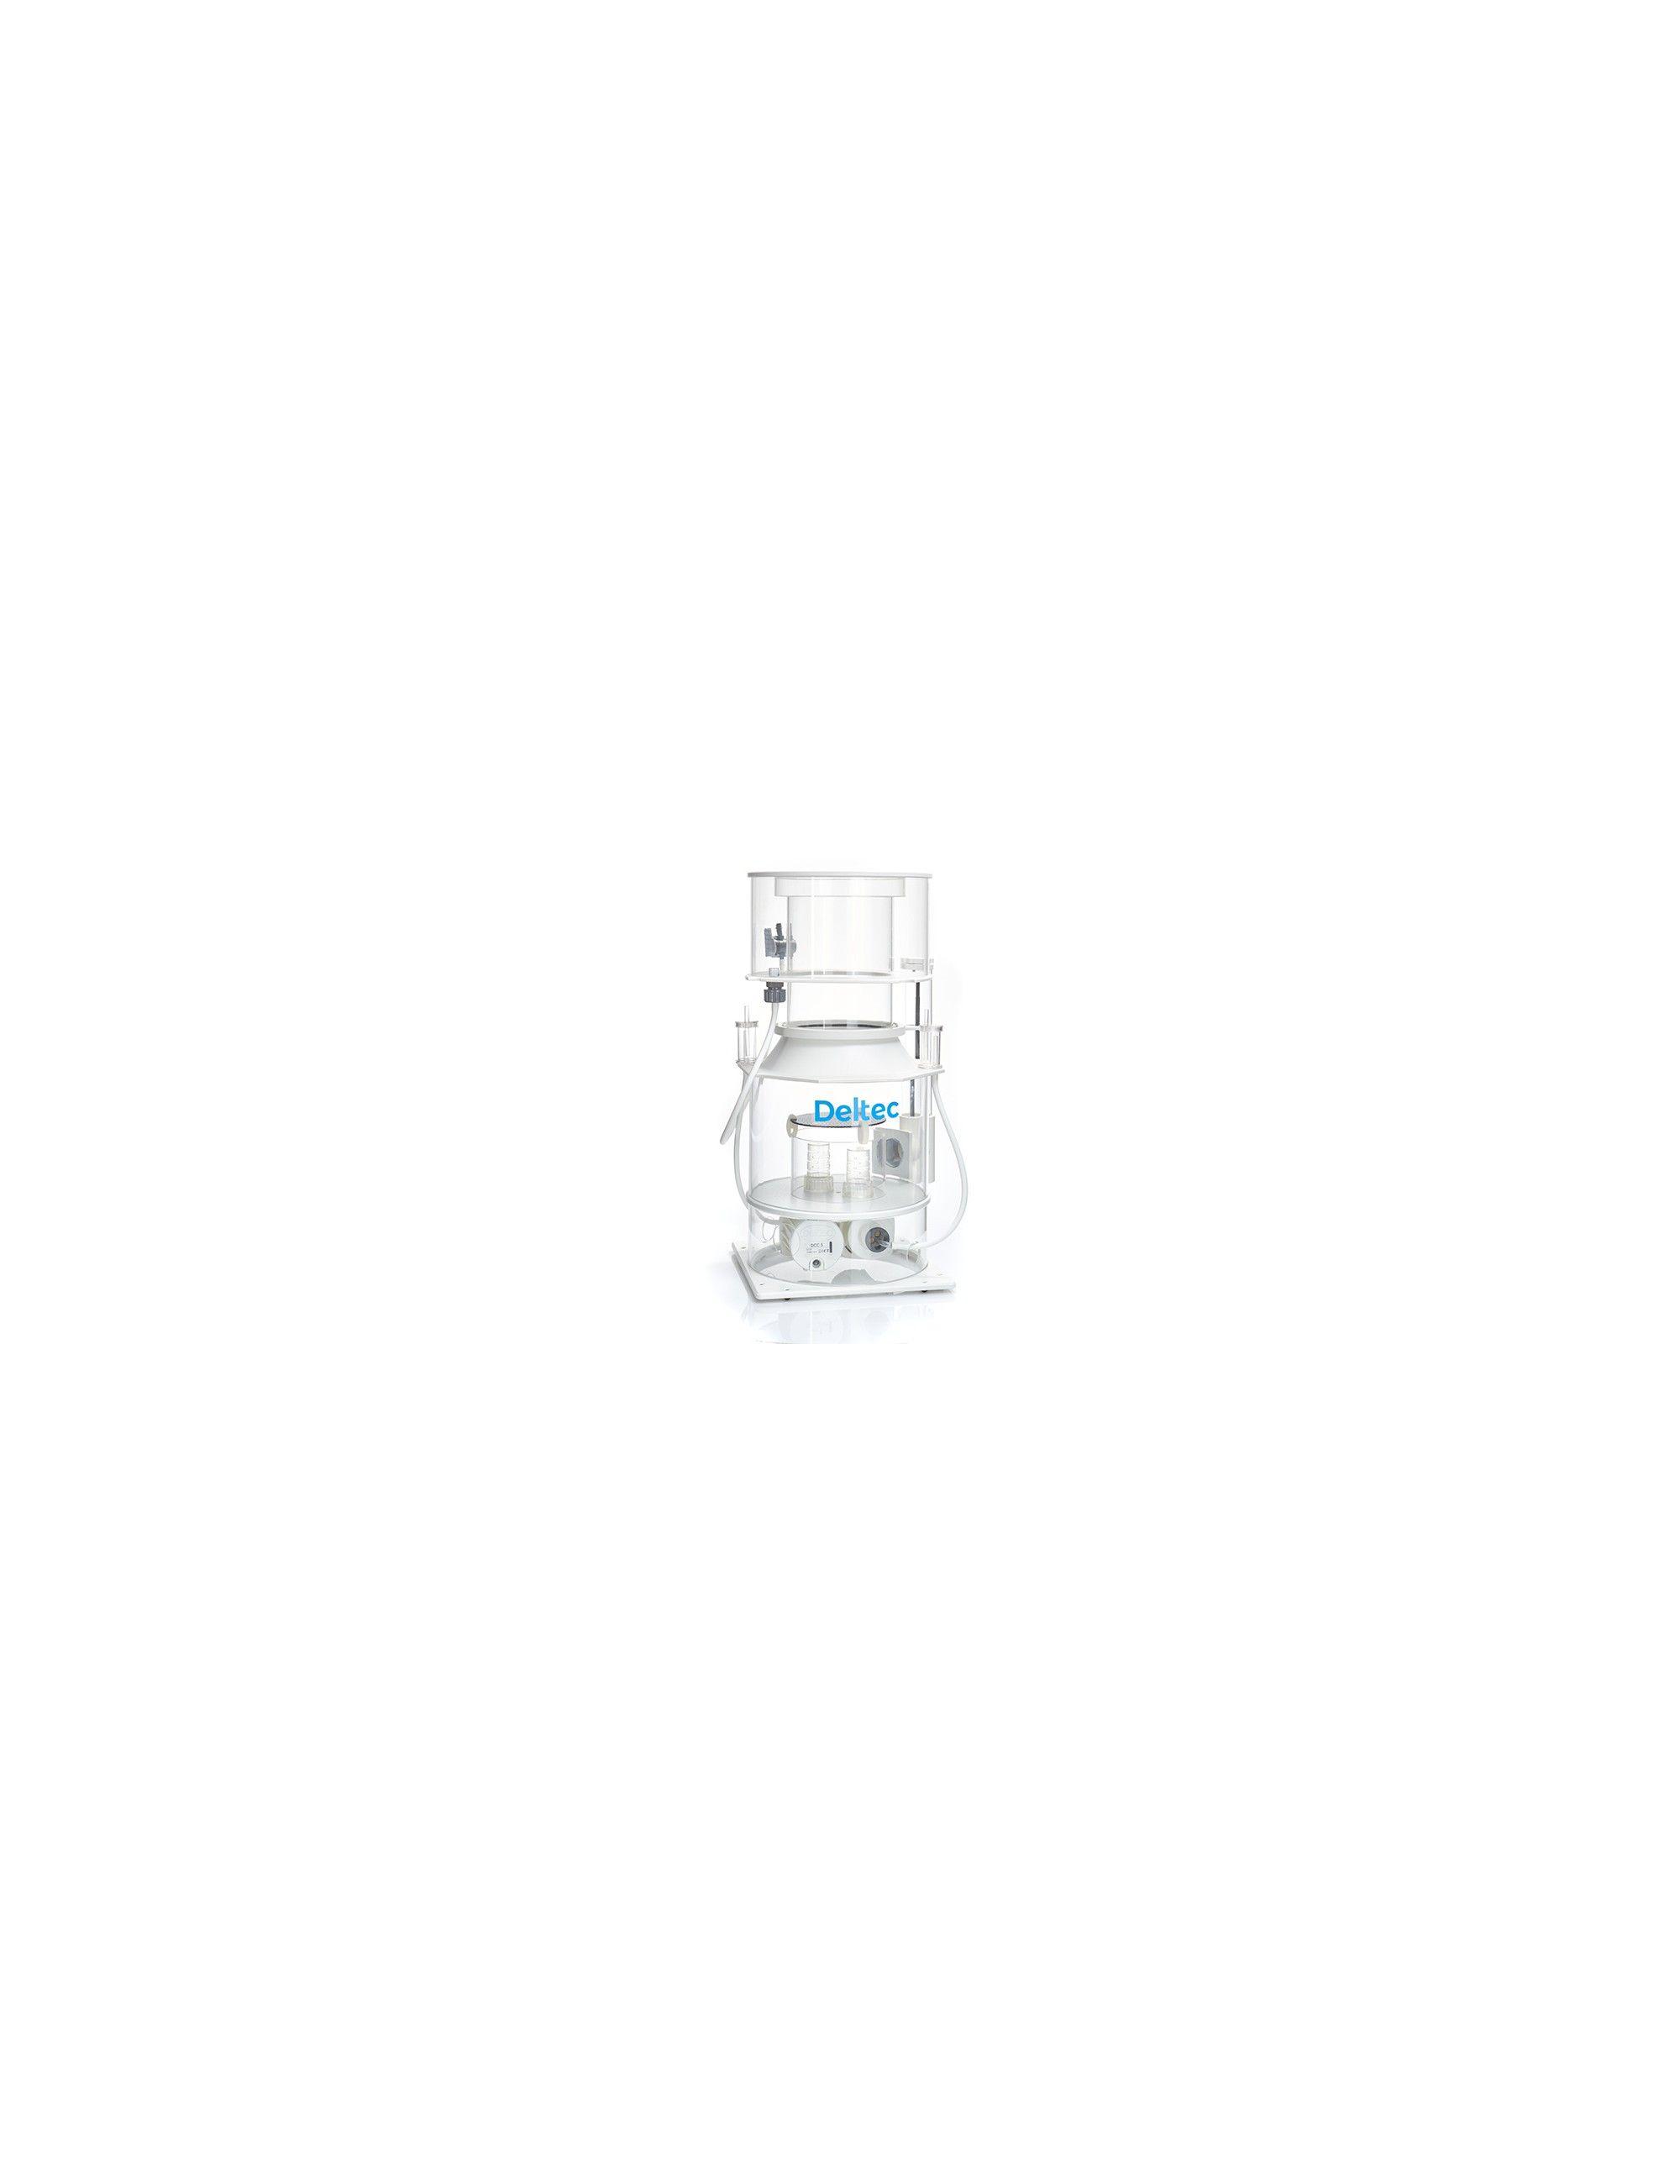 DELTEC - Skimmers internes Deltec i-Series - 6000i - Ecumeur aquarium